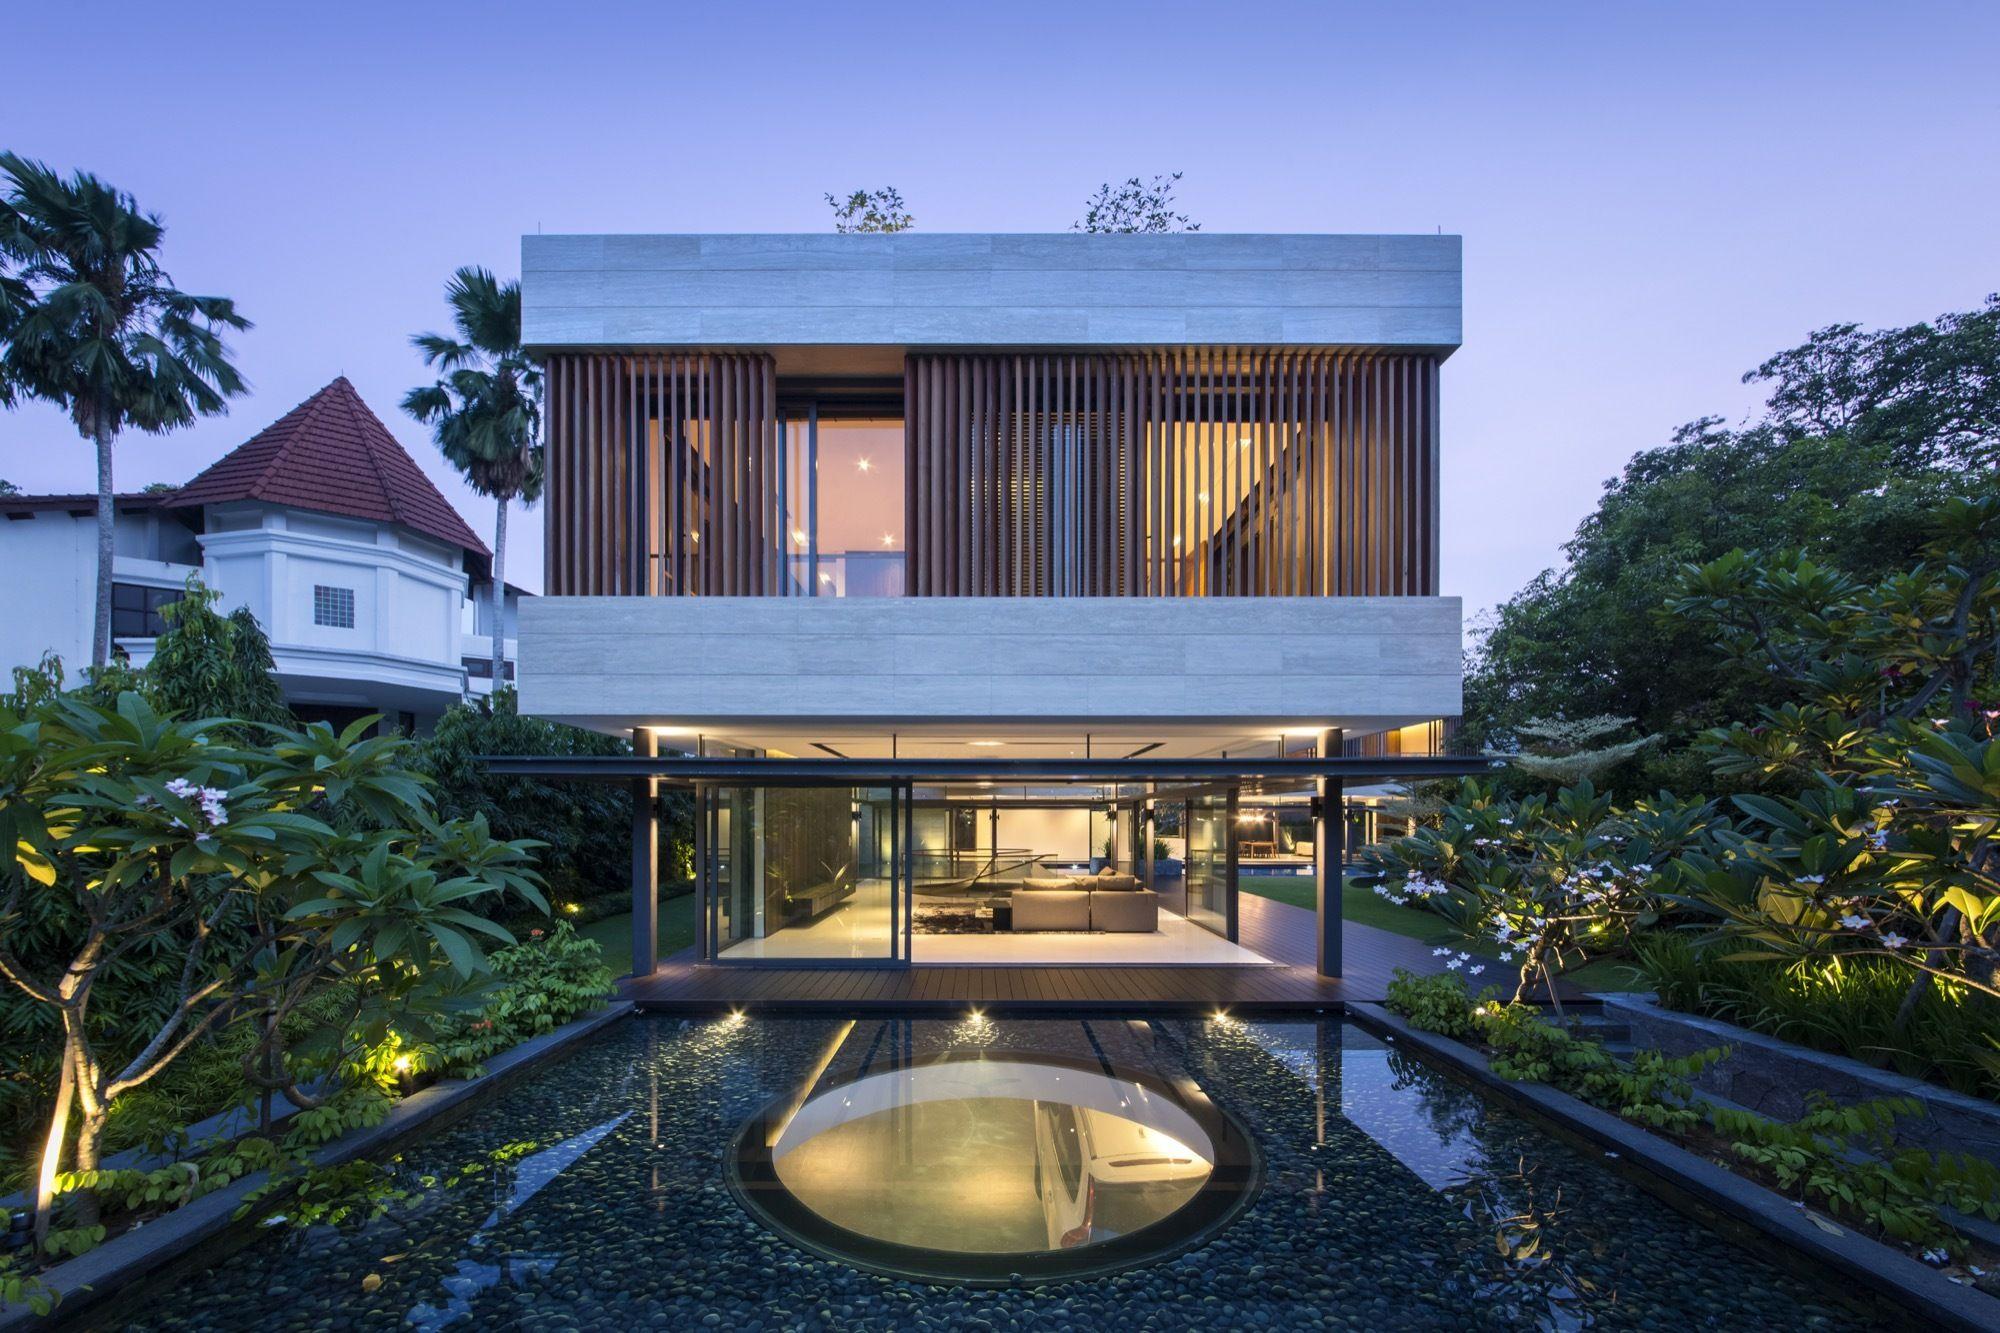 gallery of secret garden house / wallflower architecture + design